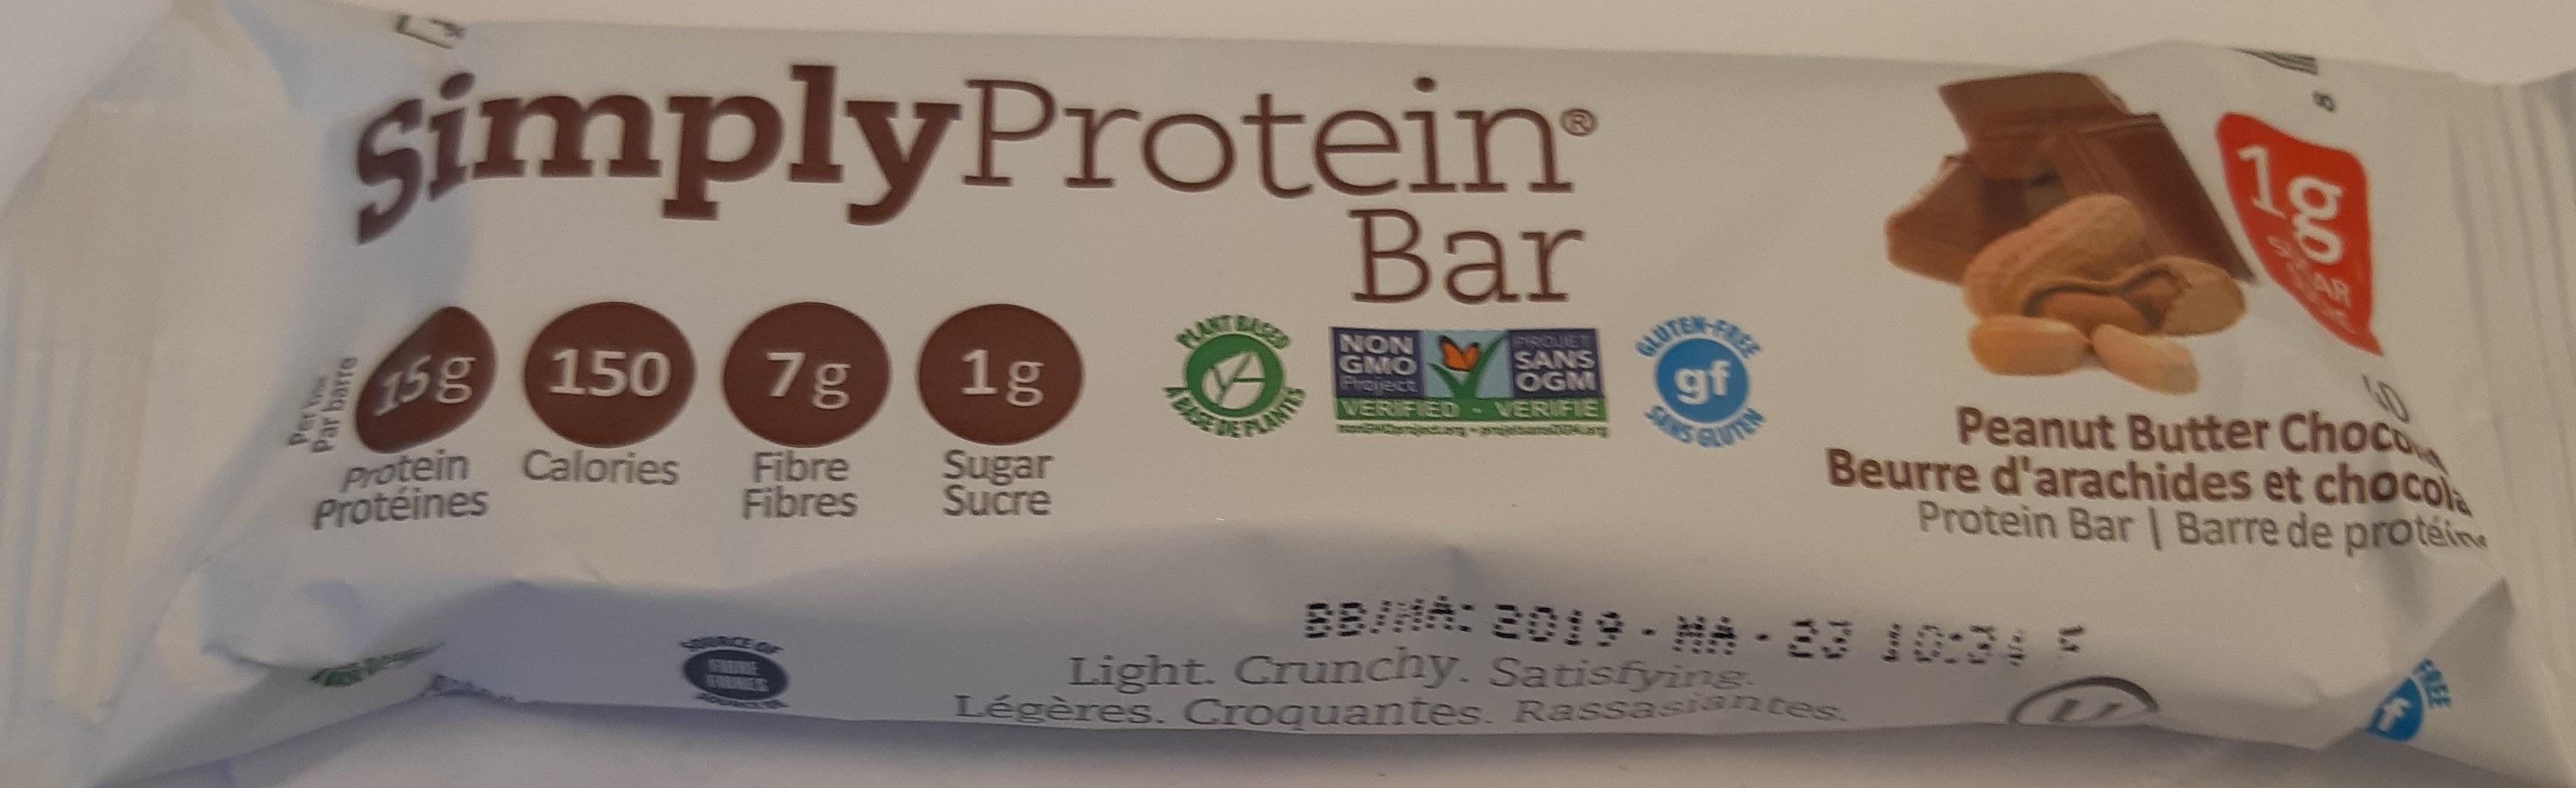 Peanut Butter Chocolate Protein Bar - Produit - fr